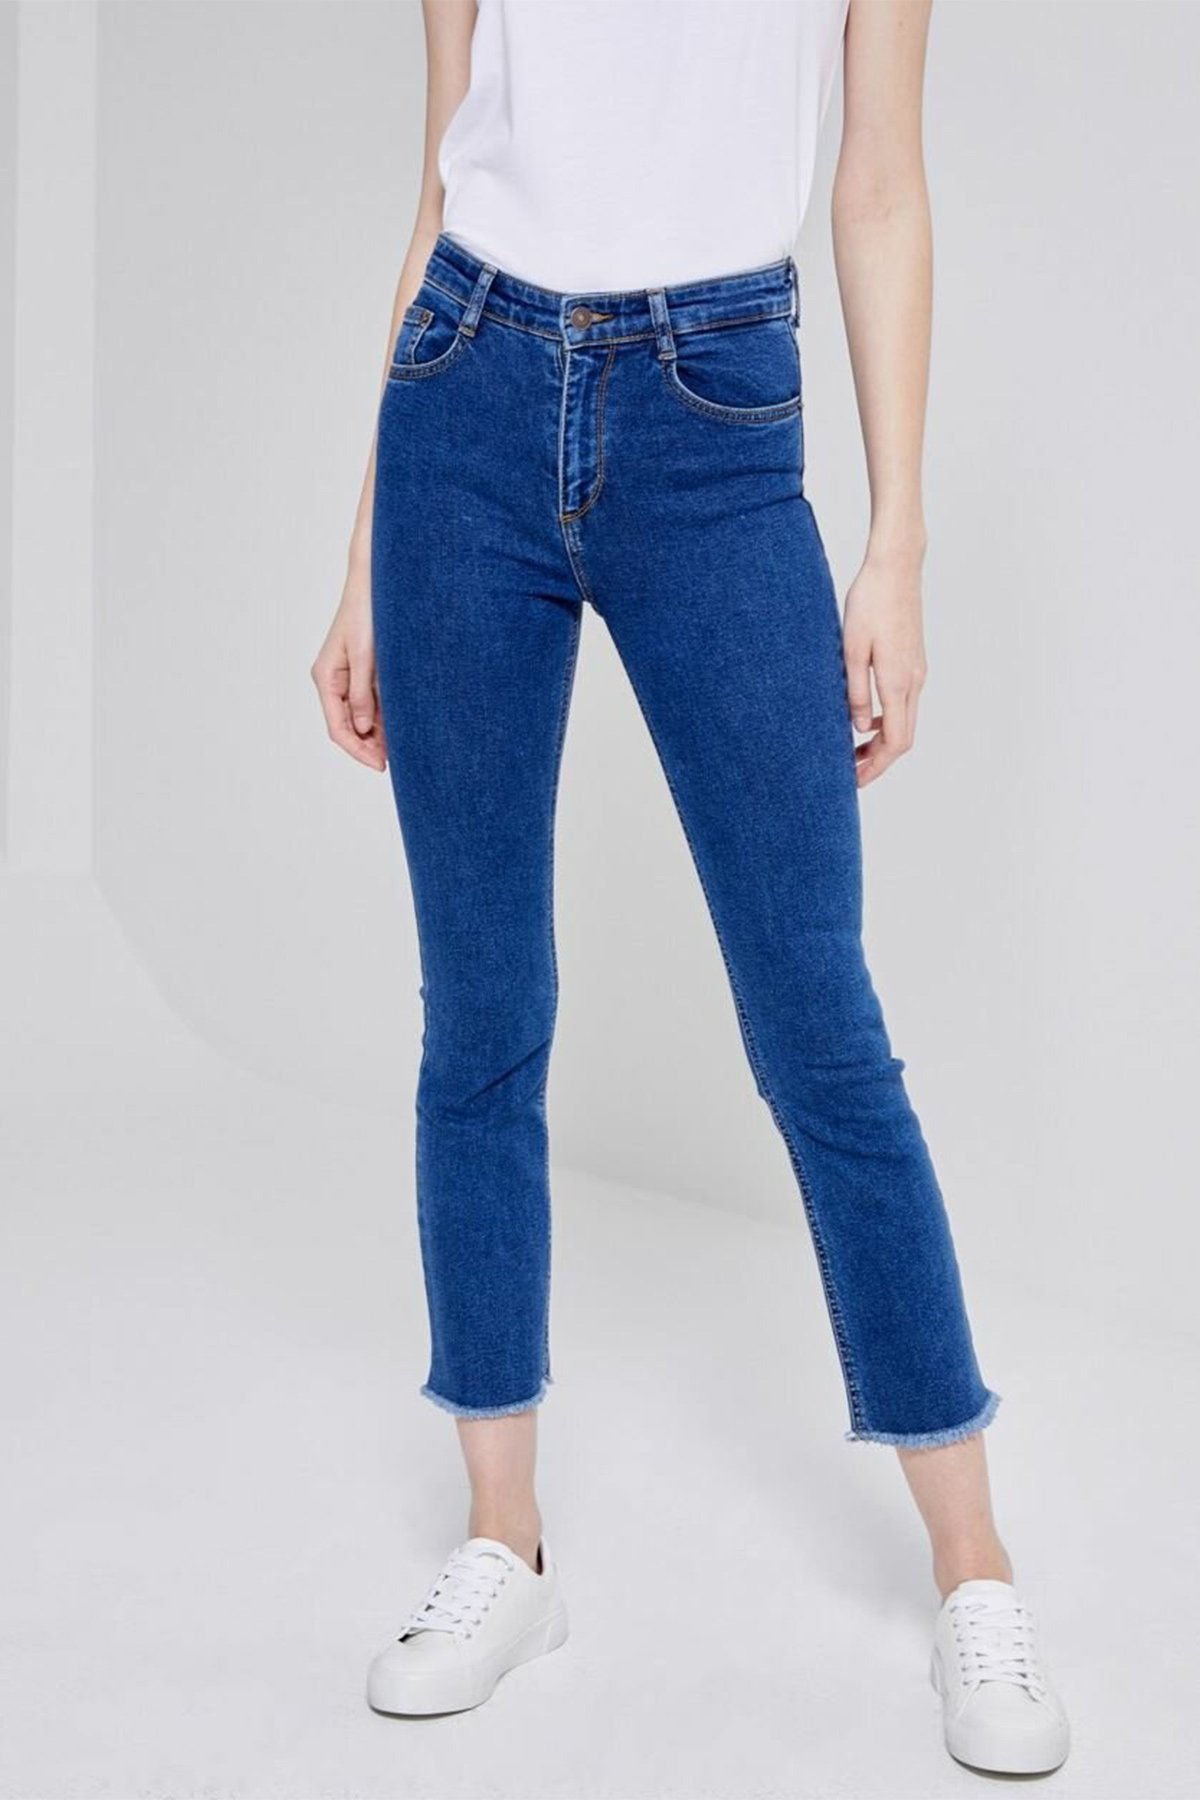 https://resim.oddamoda.com/01009513511438953009/jadoreswa/ltb-lynda-jadores-jeans-01009513511438953009-57082-2968.jpg